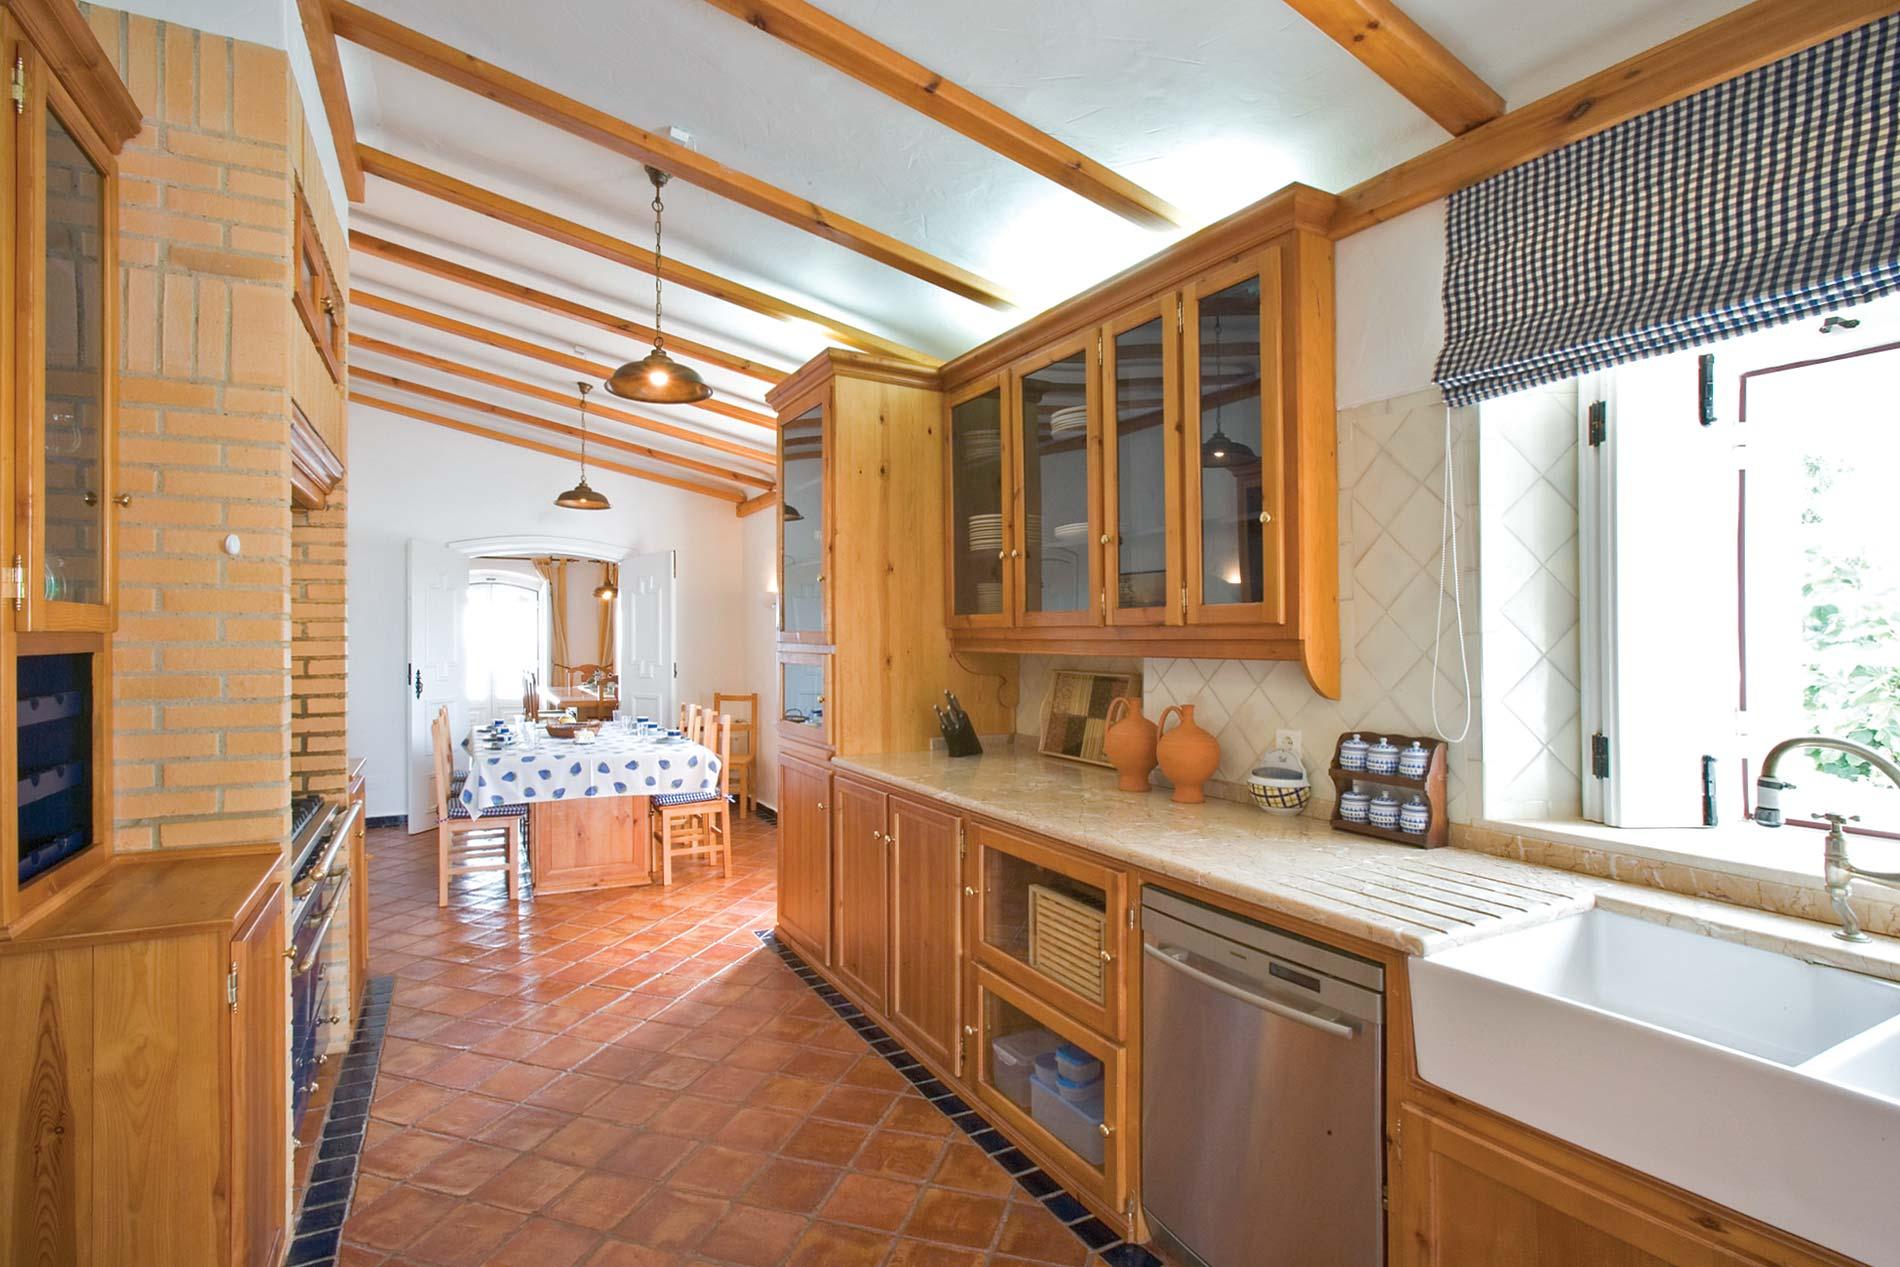 Villa Casa Cahombo in Boliqueime - sleeps 14 people